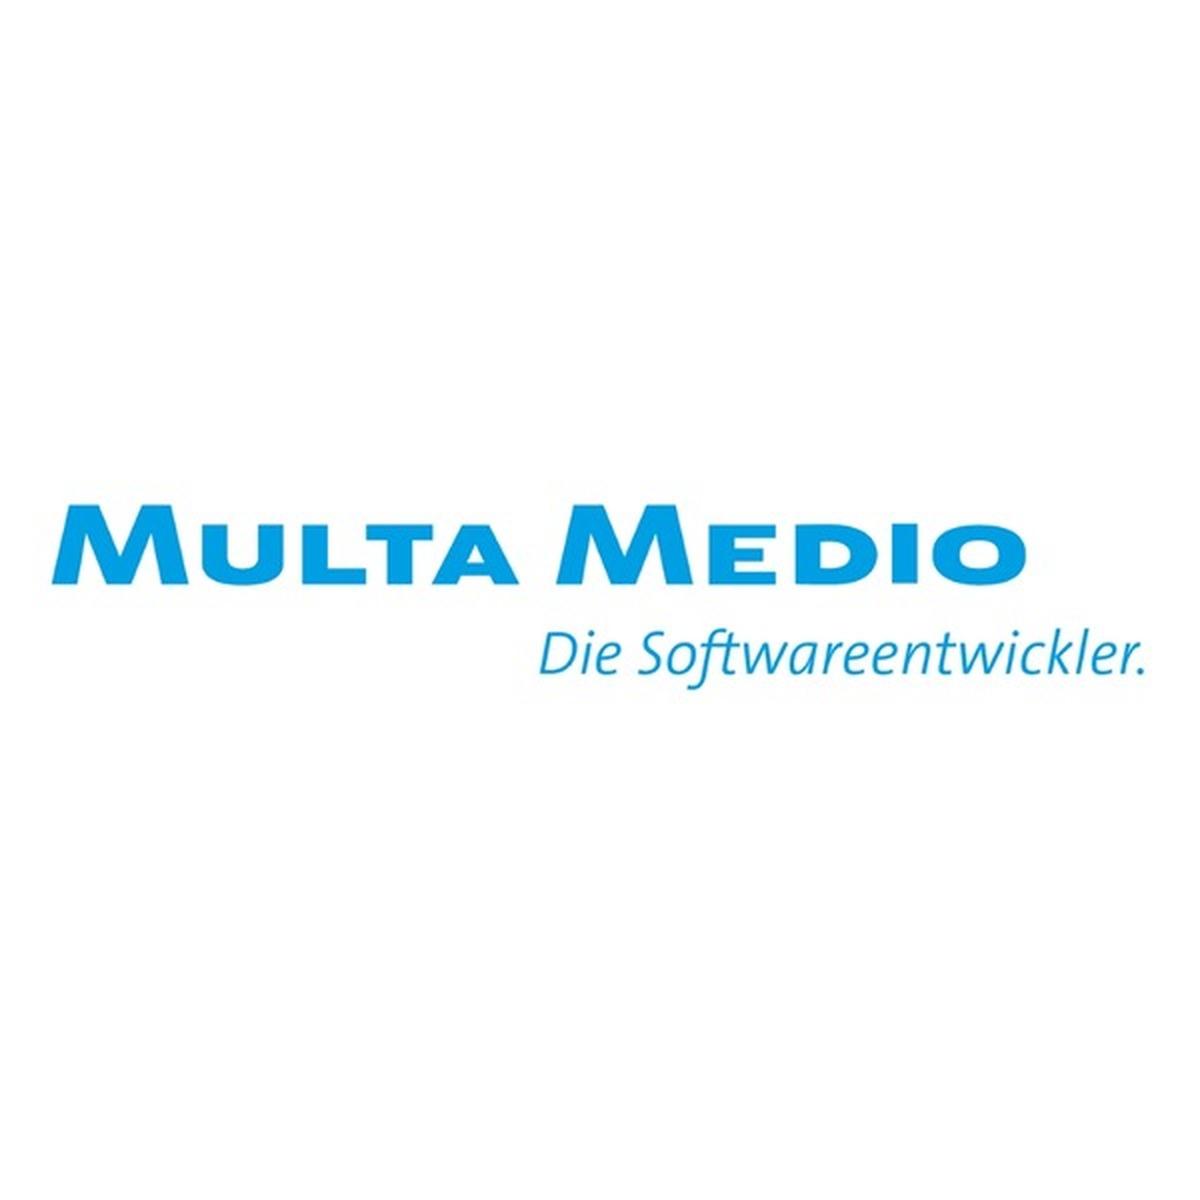 Web-Entwickler (m/w/d) in Würzburg